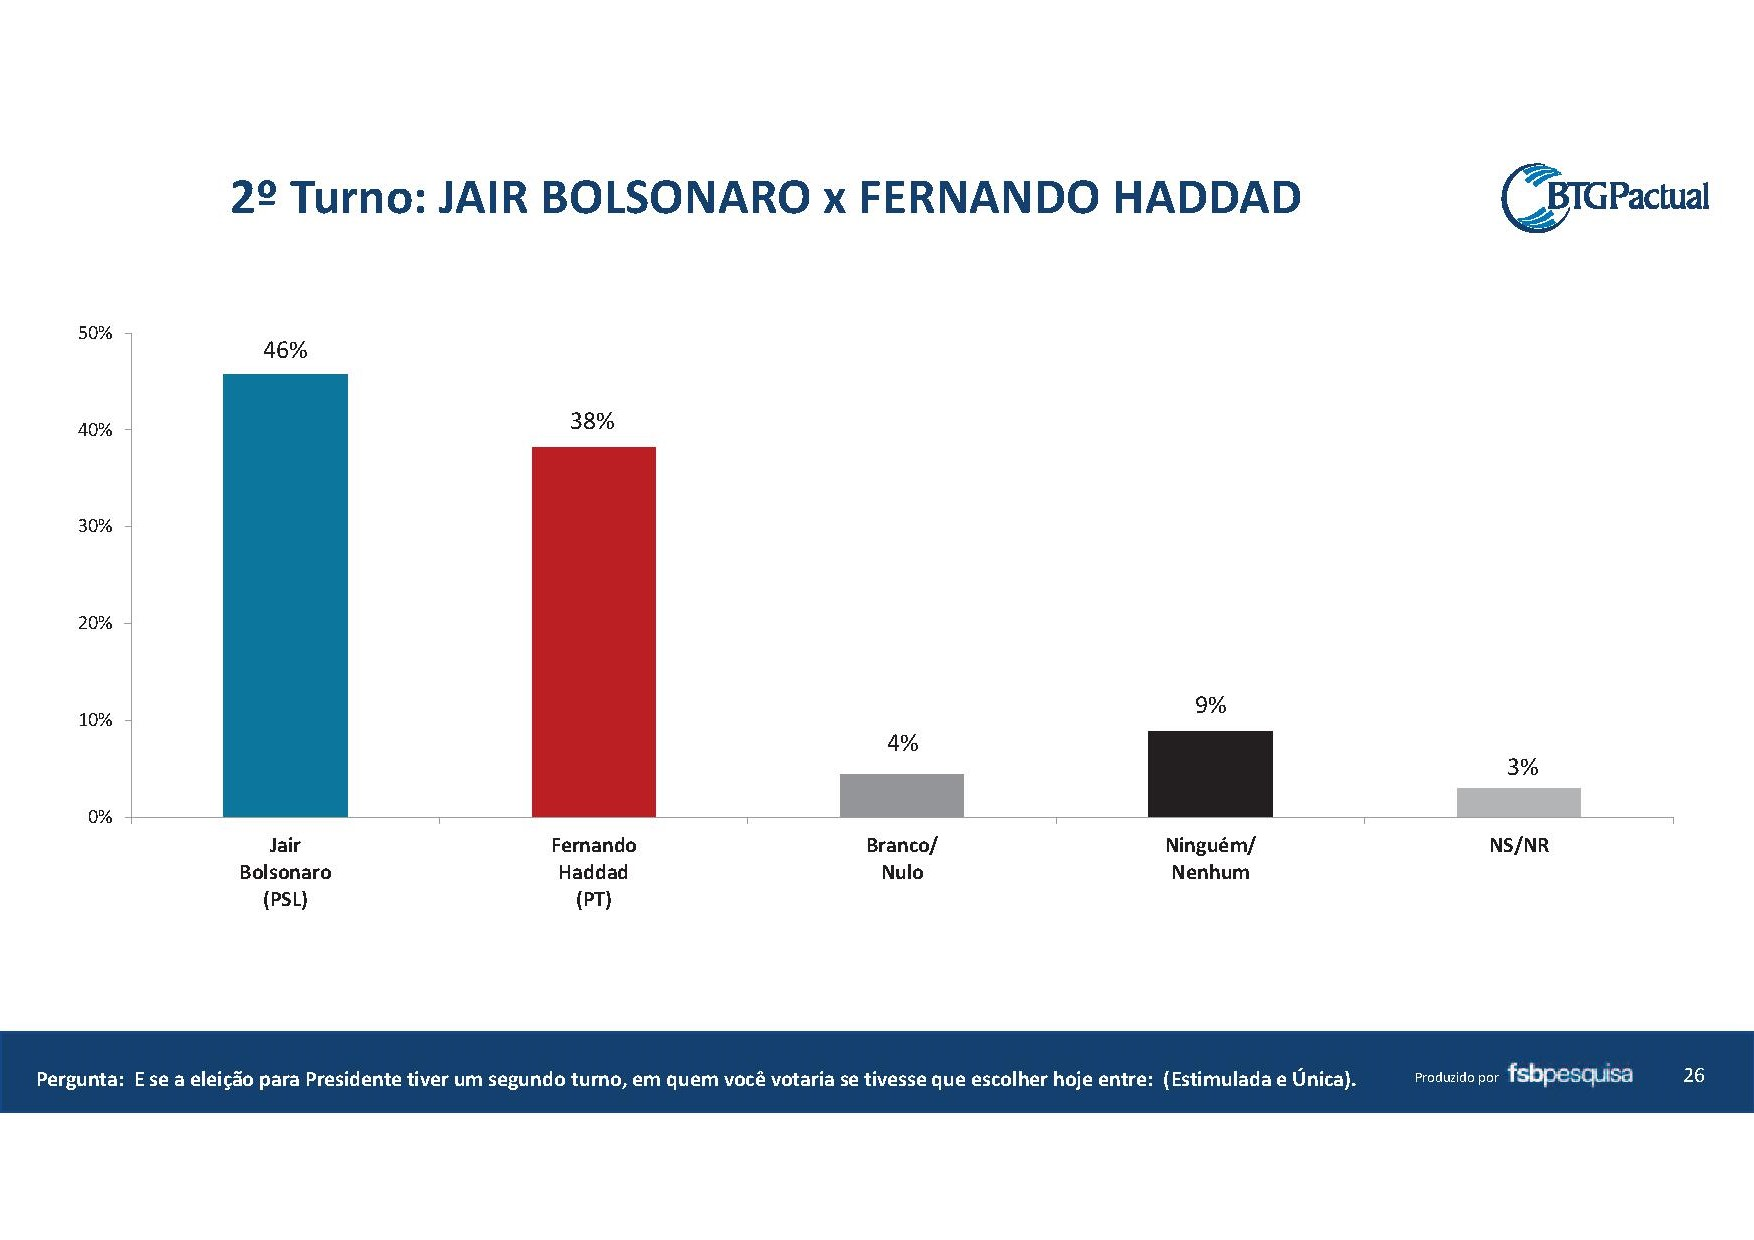 pesquisa bolsonaro venceria haddad no segundo turno